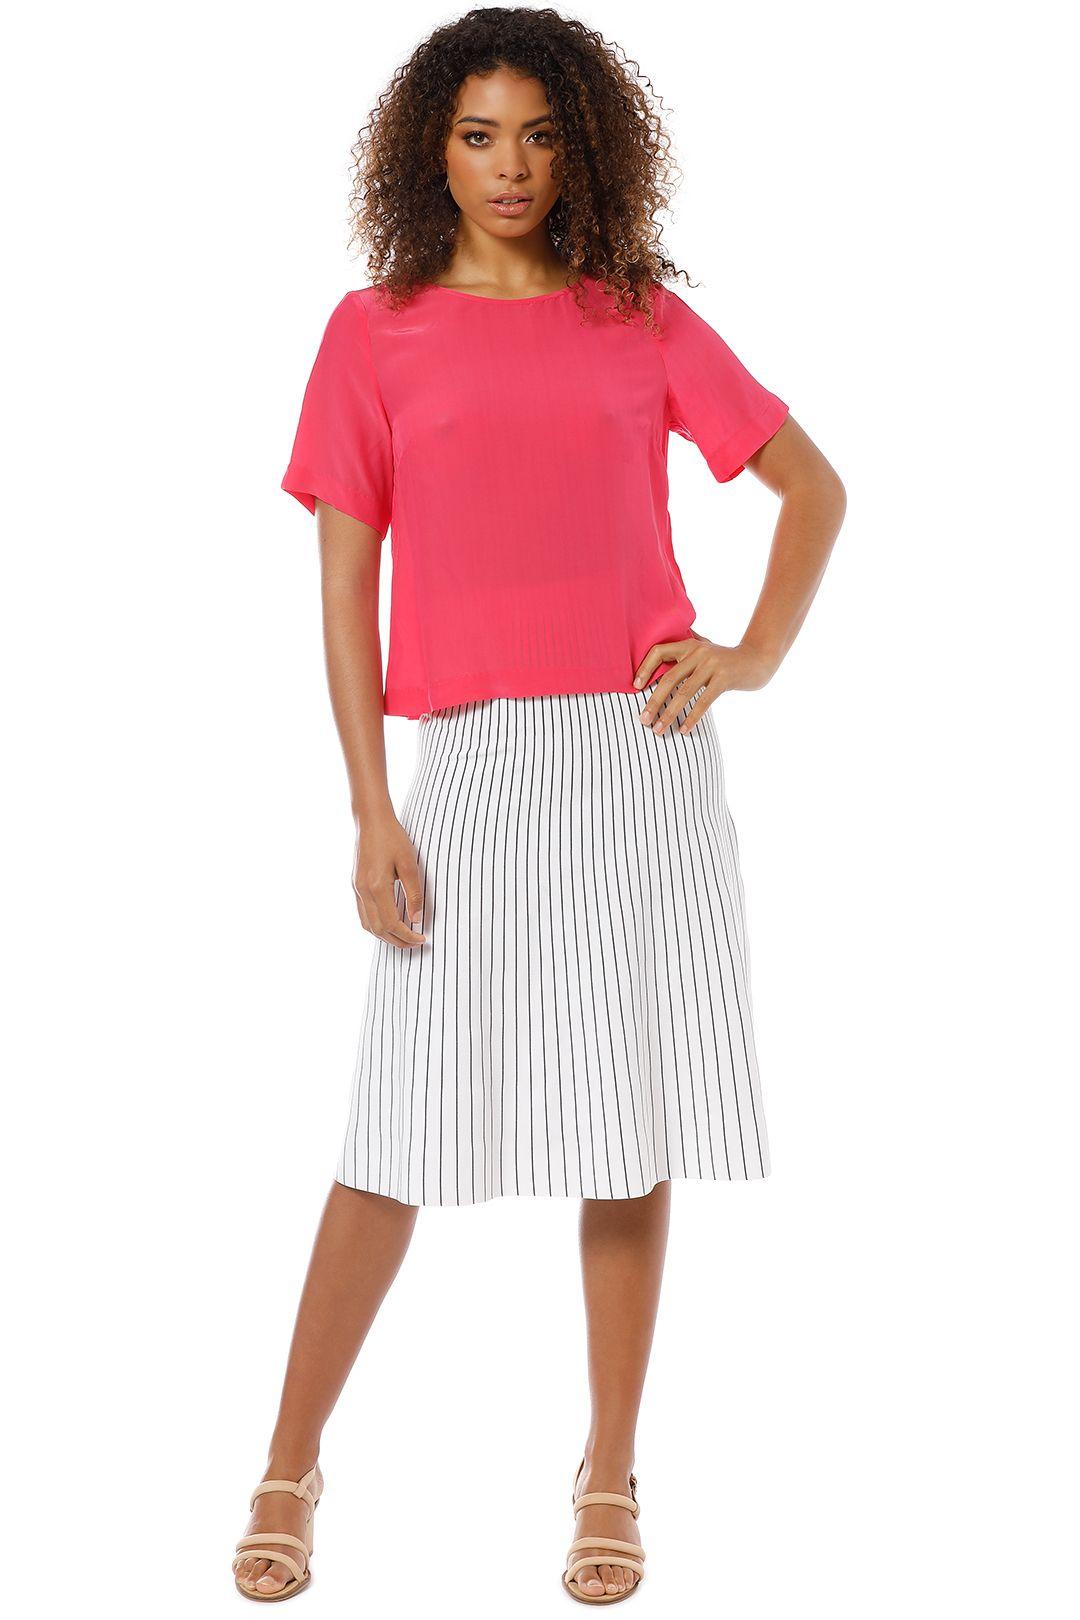 Gorman  Fuschia Pop Top - Pink - Front